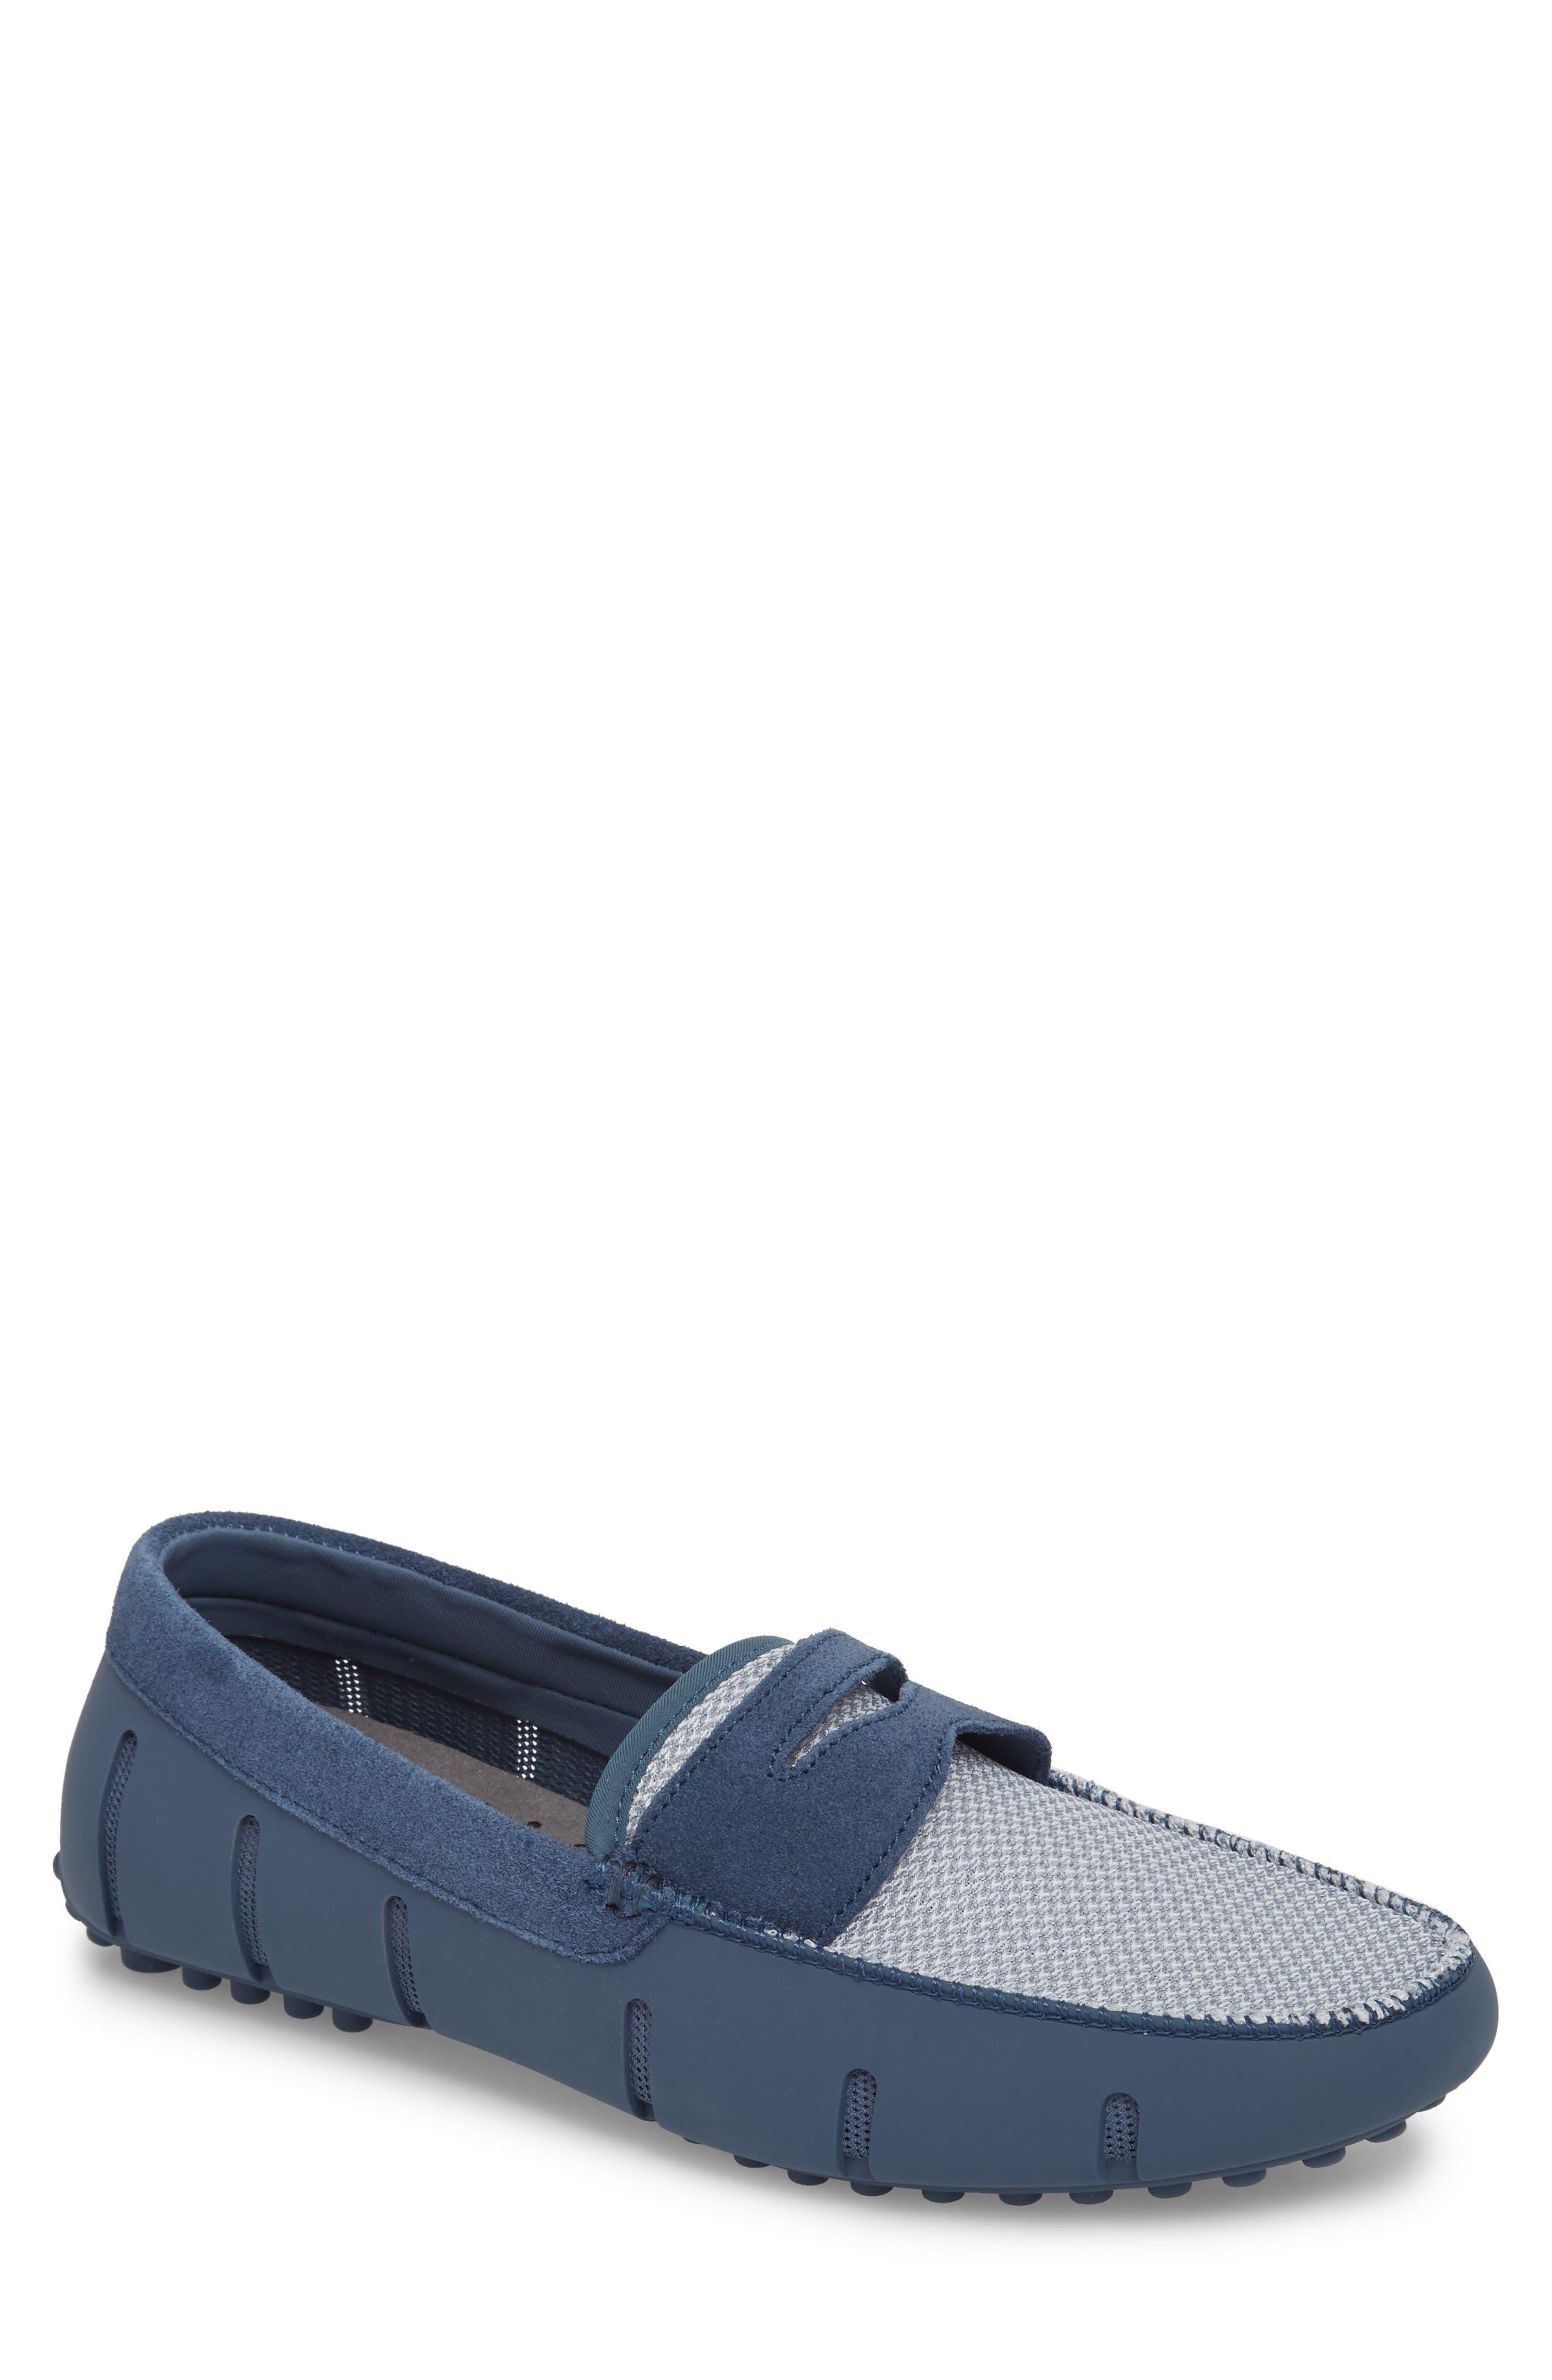 Driving Shoe,                         Main,                         color, SLATE/ WHITE FABRIC